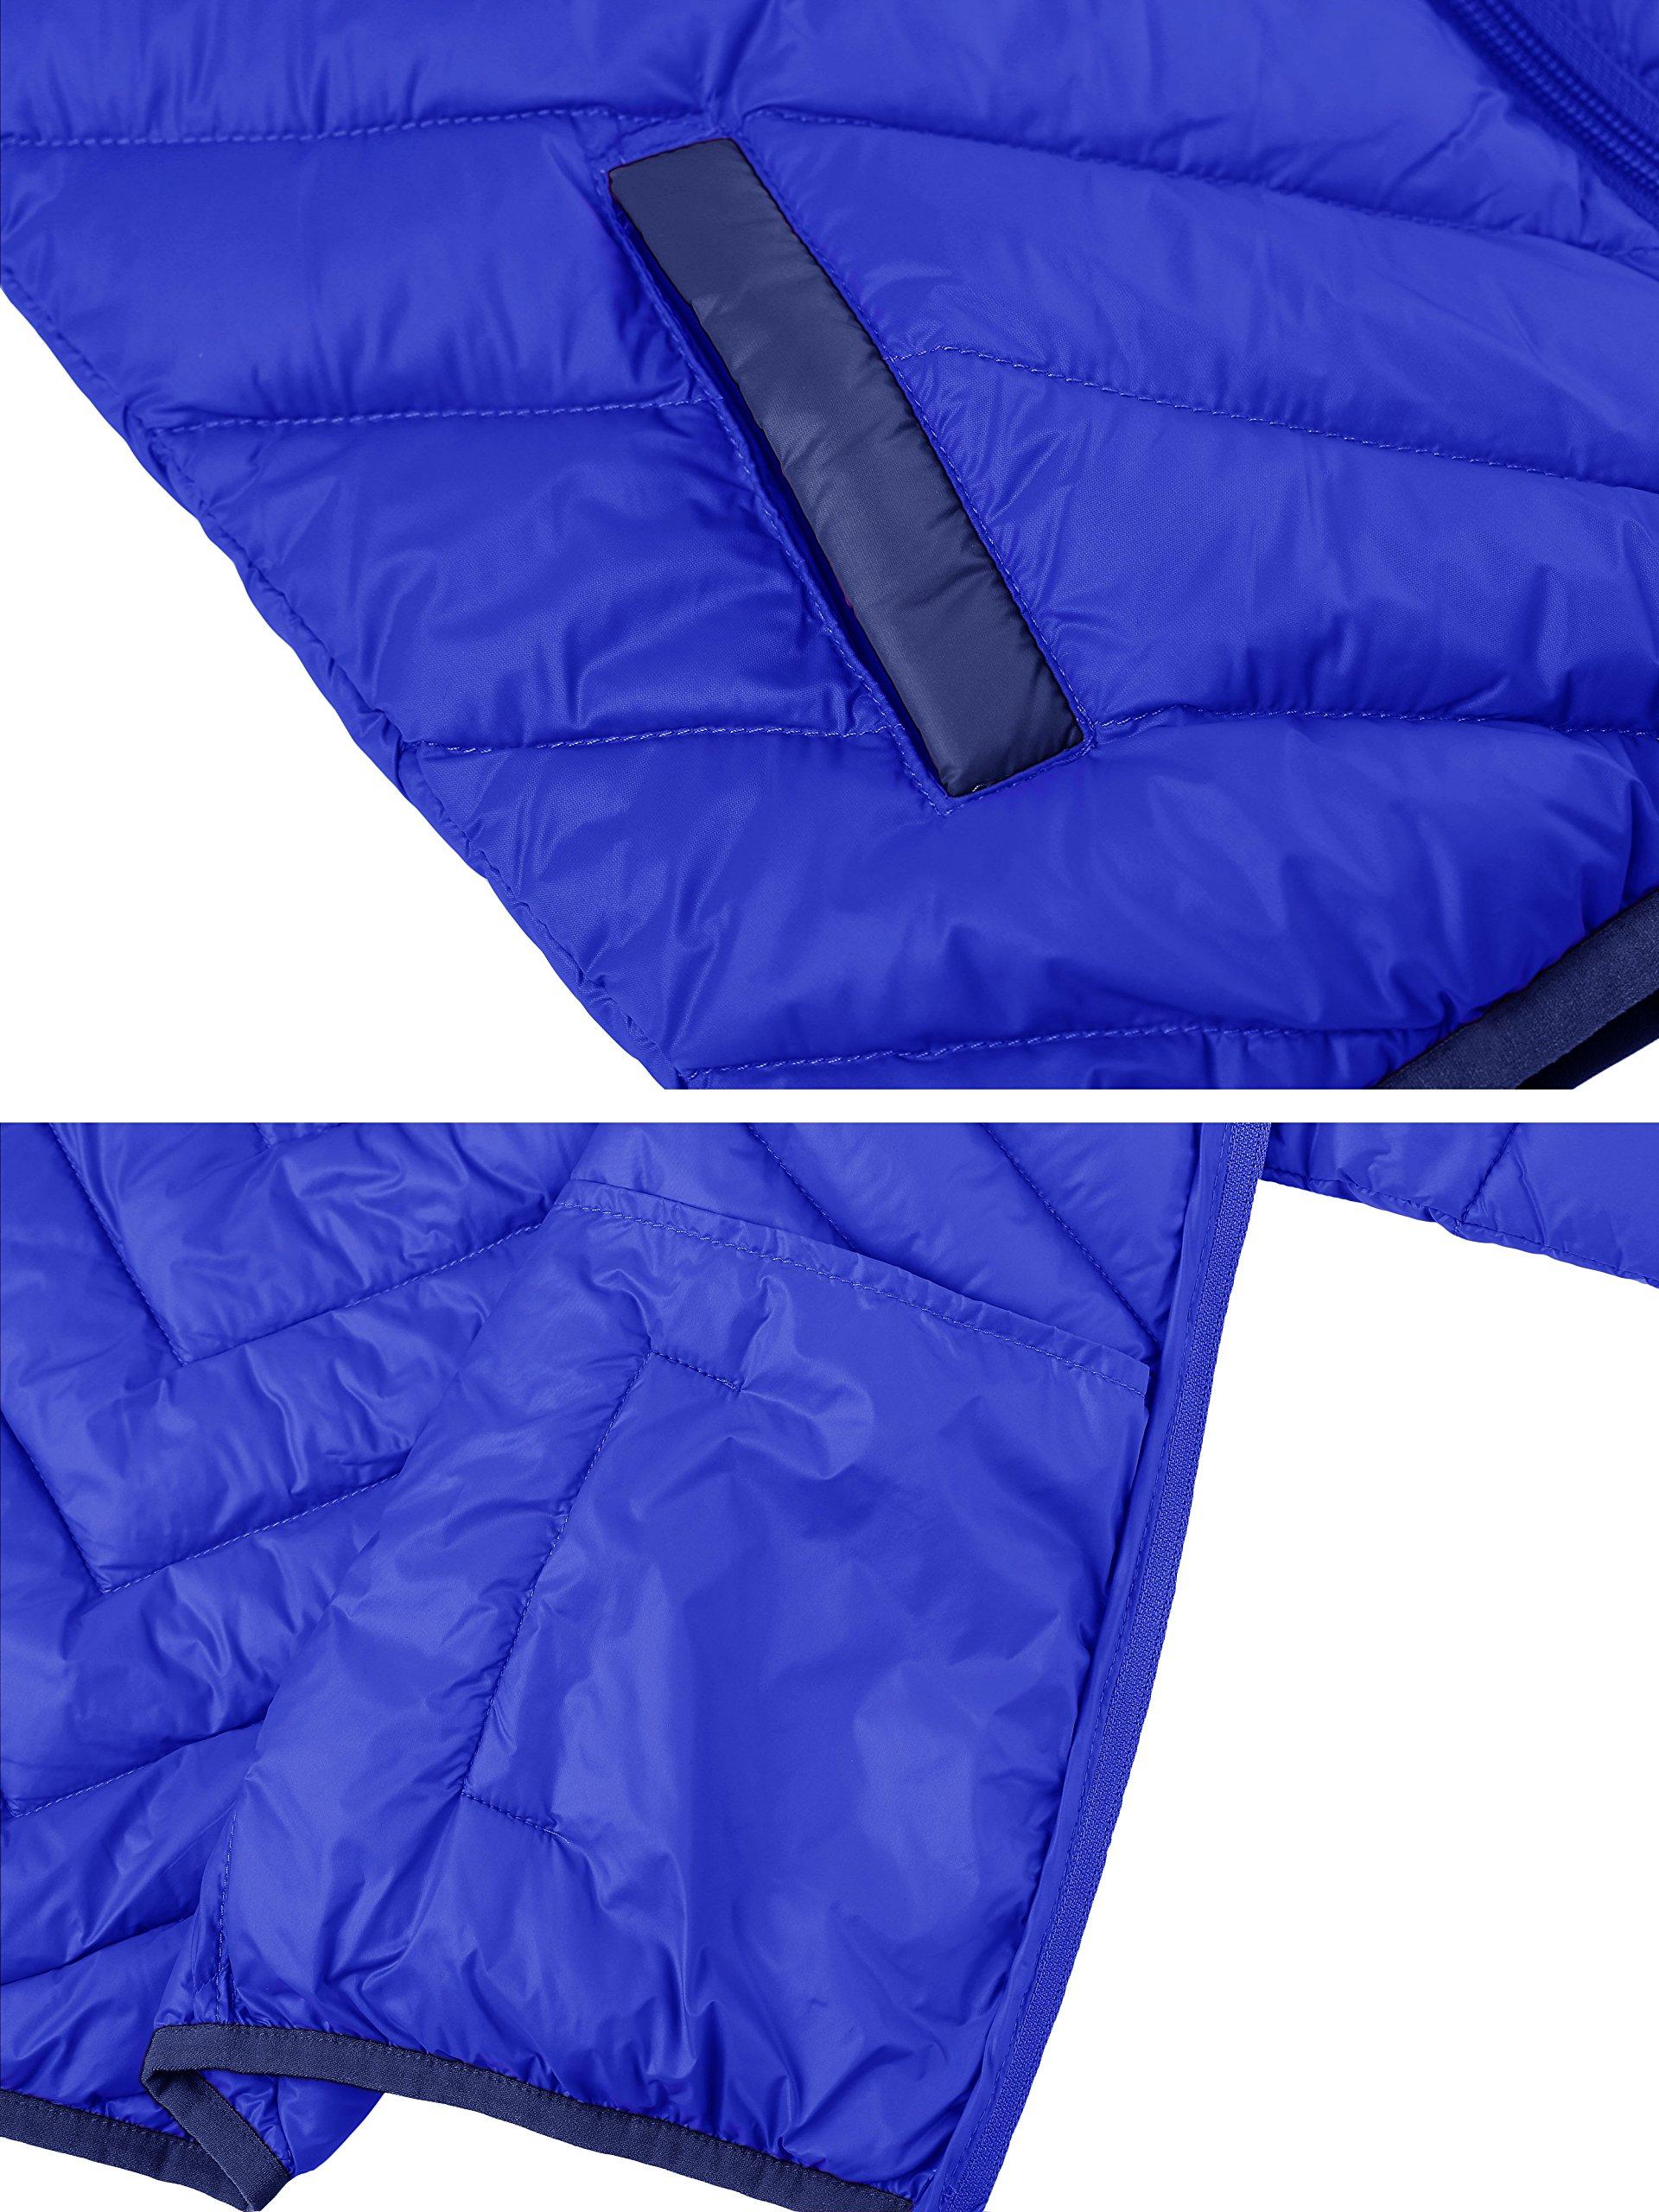 Wantdo Boy's Lightweight Packable Puffer Down Jacket Hooded Windproof Color Block Winter Coat(Sapphire Blue, 8) by Wantdo (Image #5)